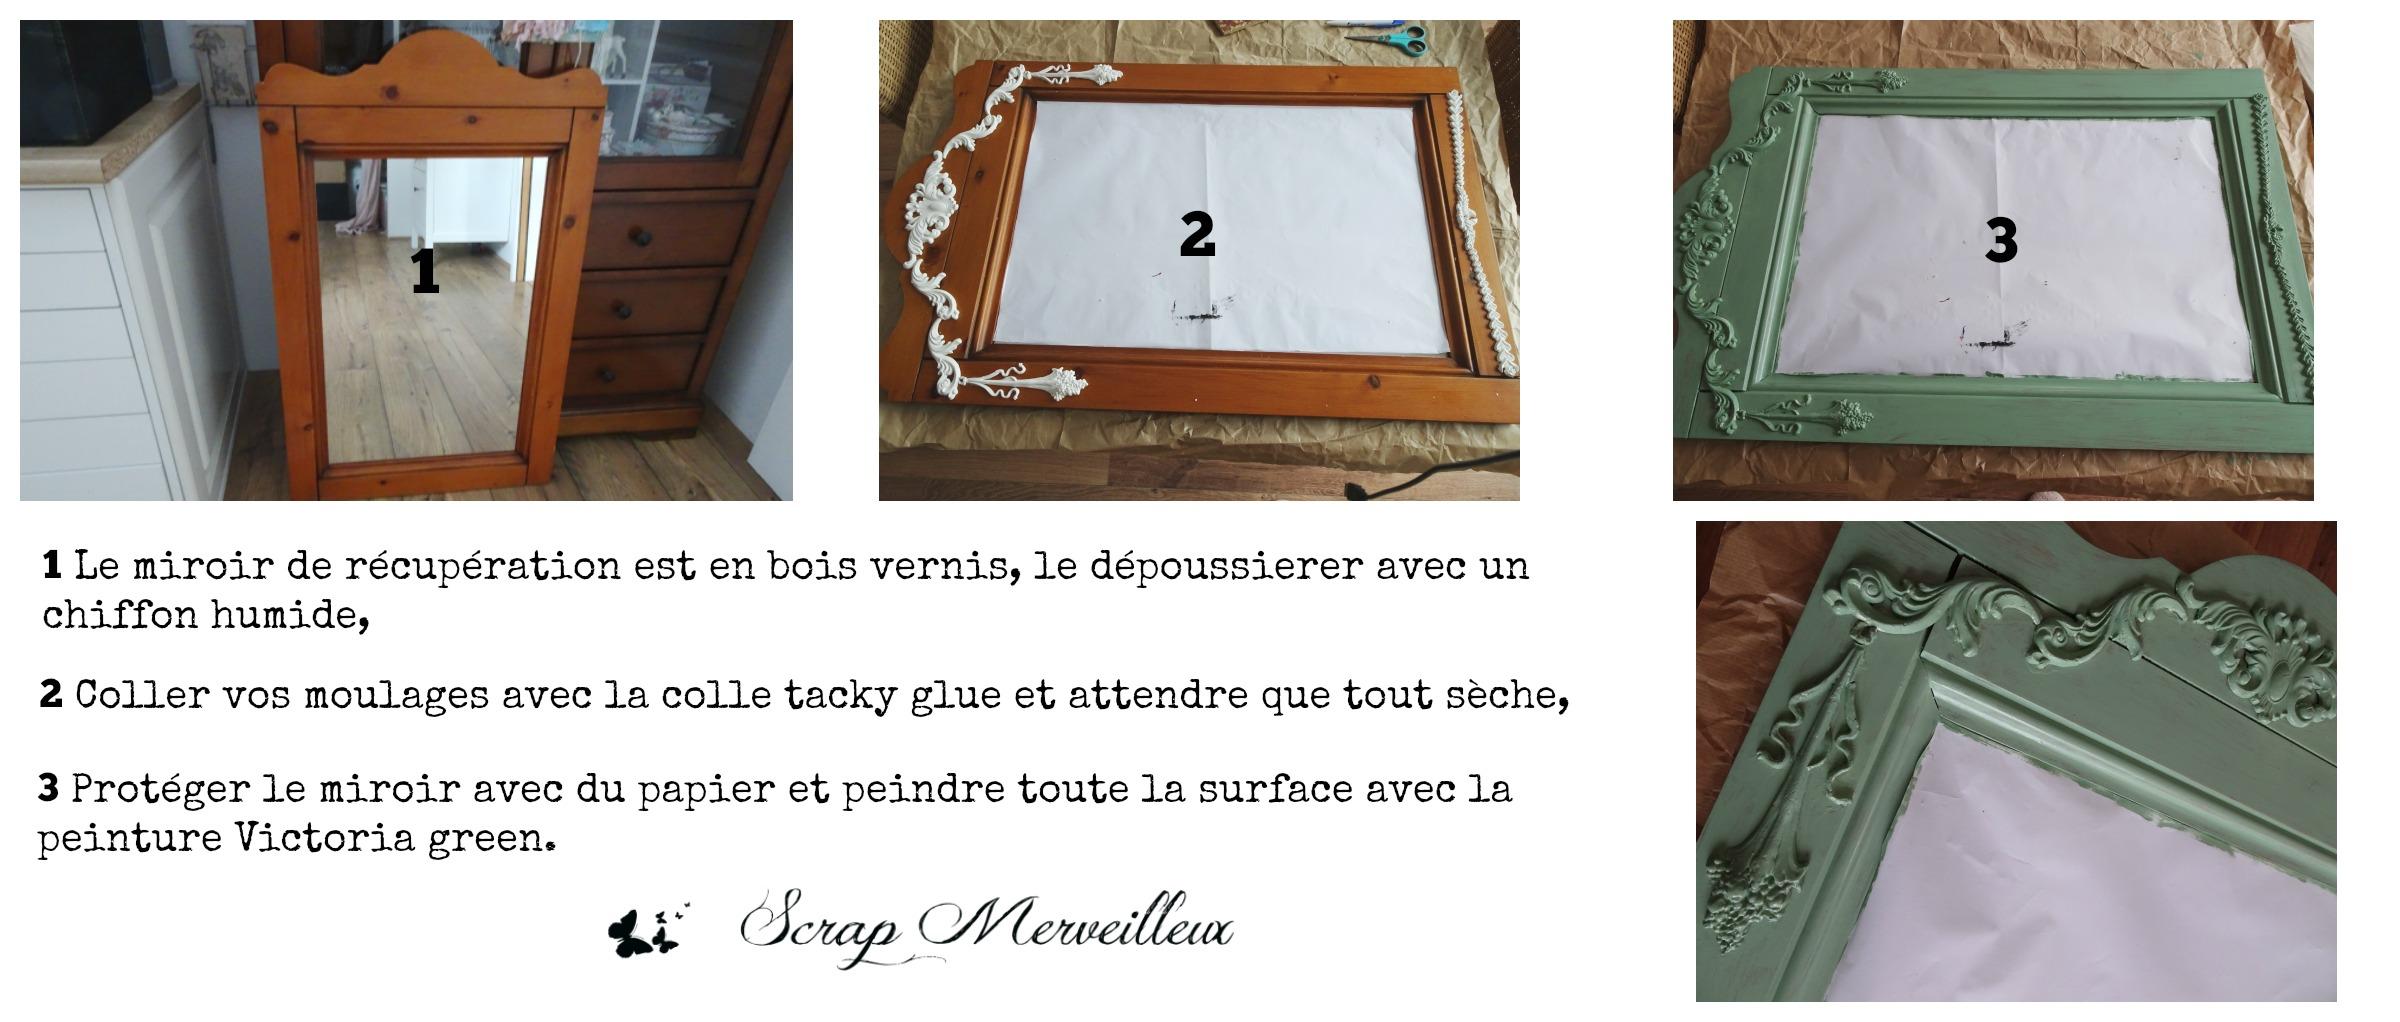 scrapmerveilleux(12)